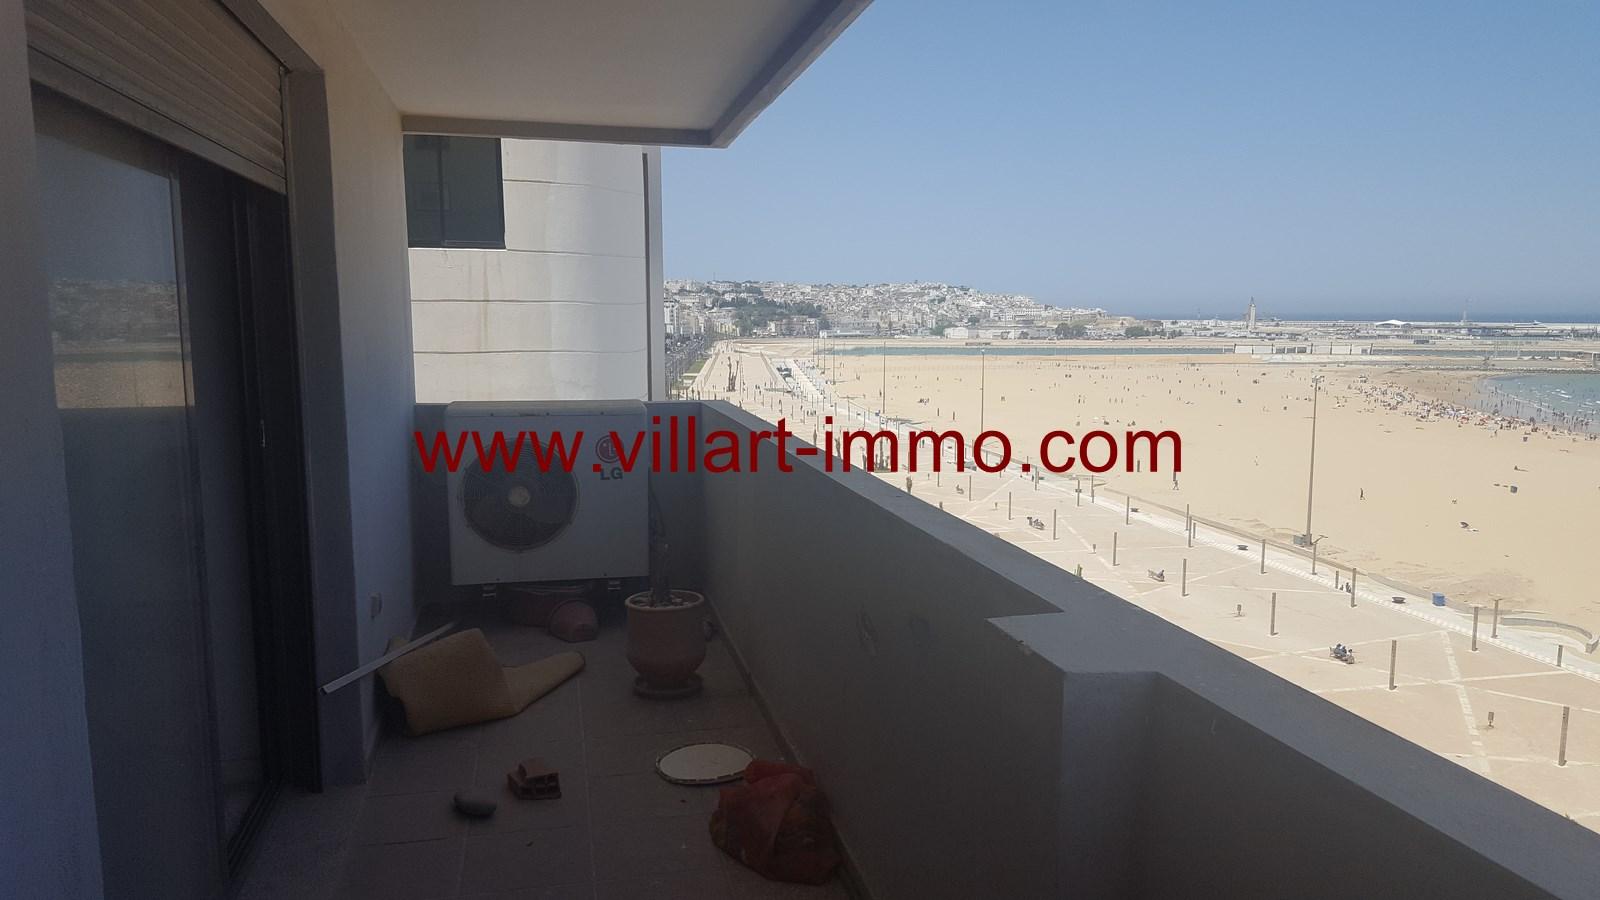 10-a-vendre-appartement-tanger-quartier-playa-terrasse-va433-villart-immo